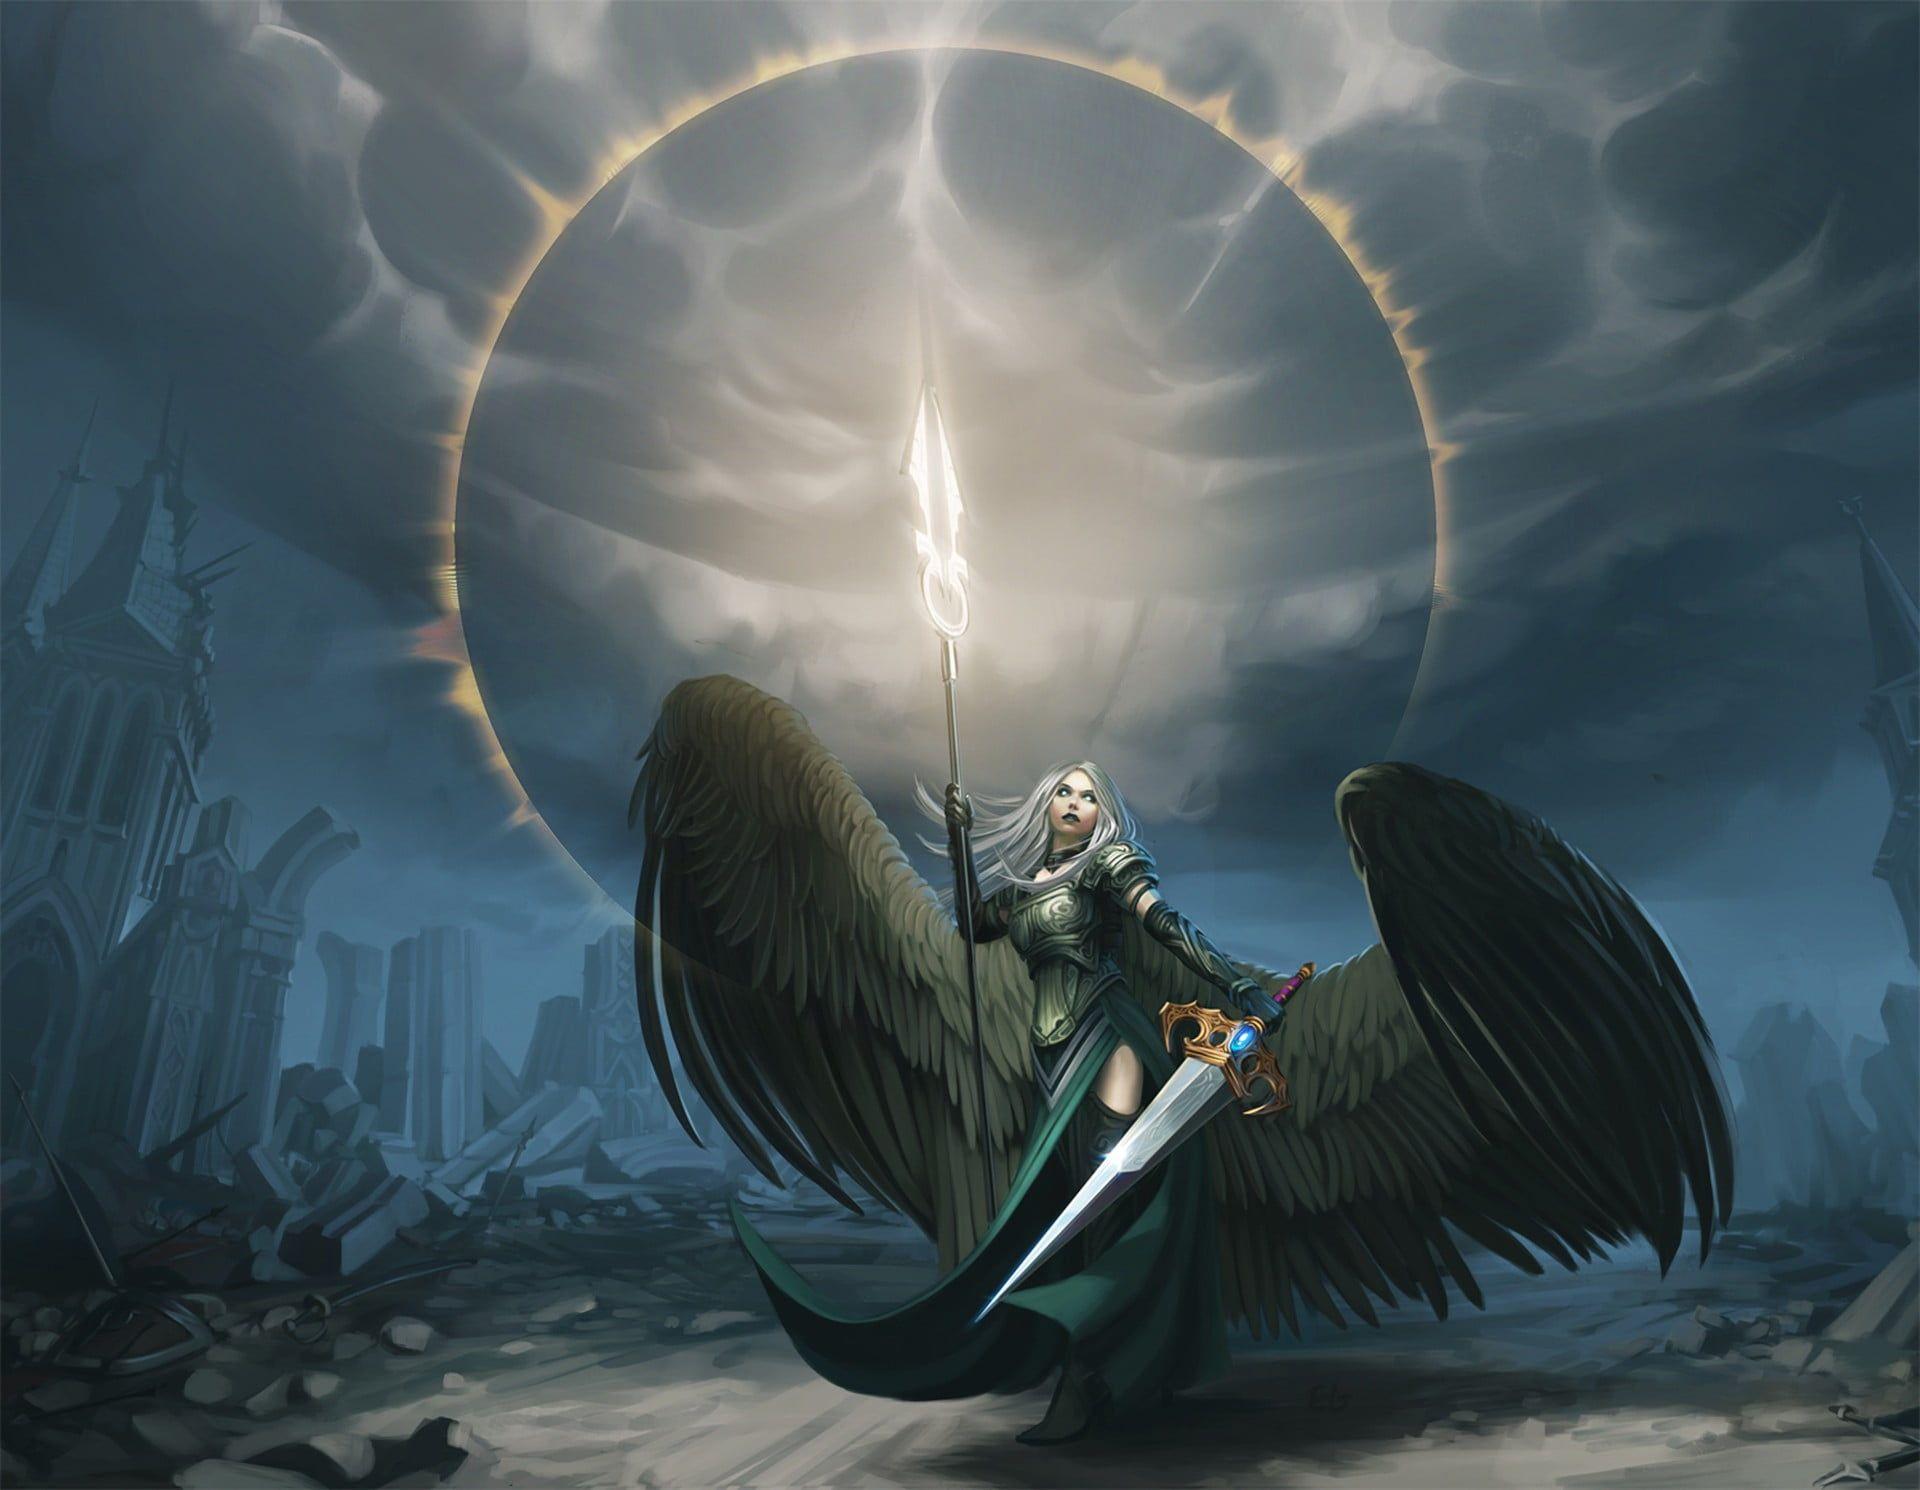 Woman With Wings Holding Sword Digital Wallpaper Angel Fantasy Art Artwork Magic The Gathering 1080p Wal In 2021 Angel Of Vengeance Fantasy Art Fantasy Art Angels